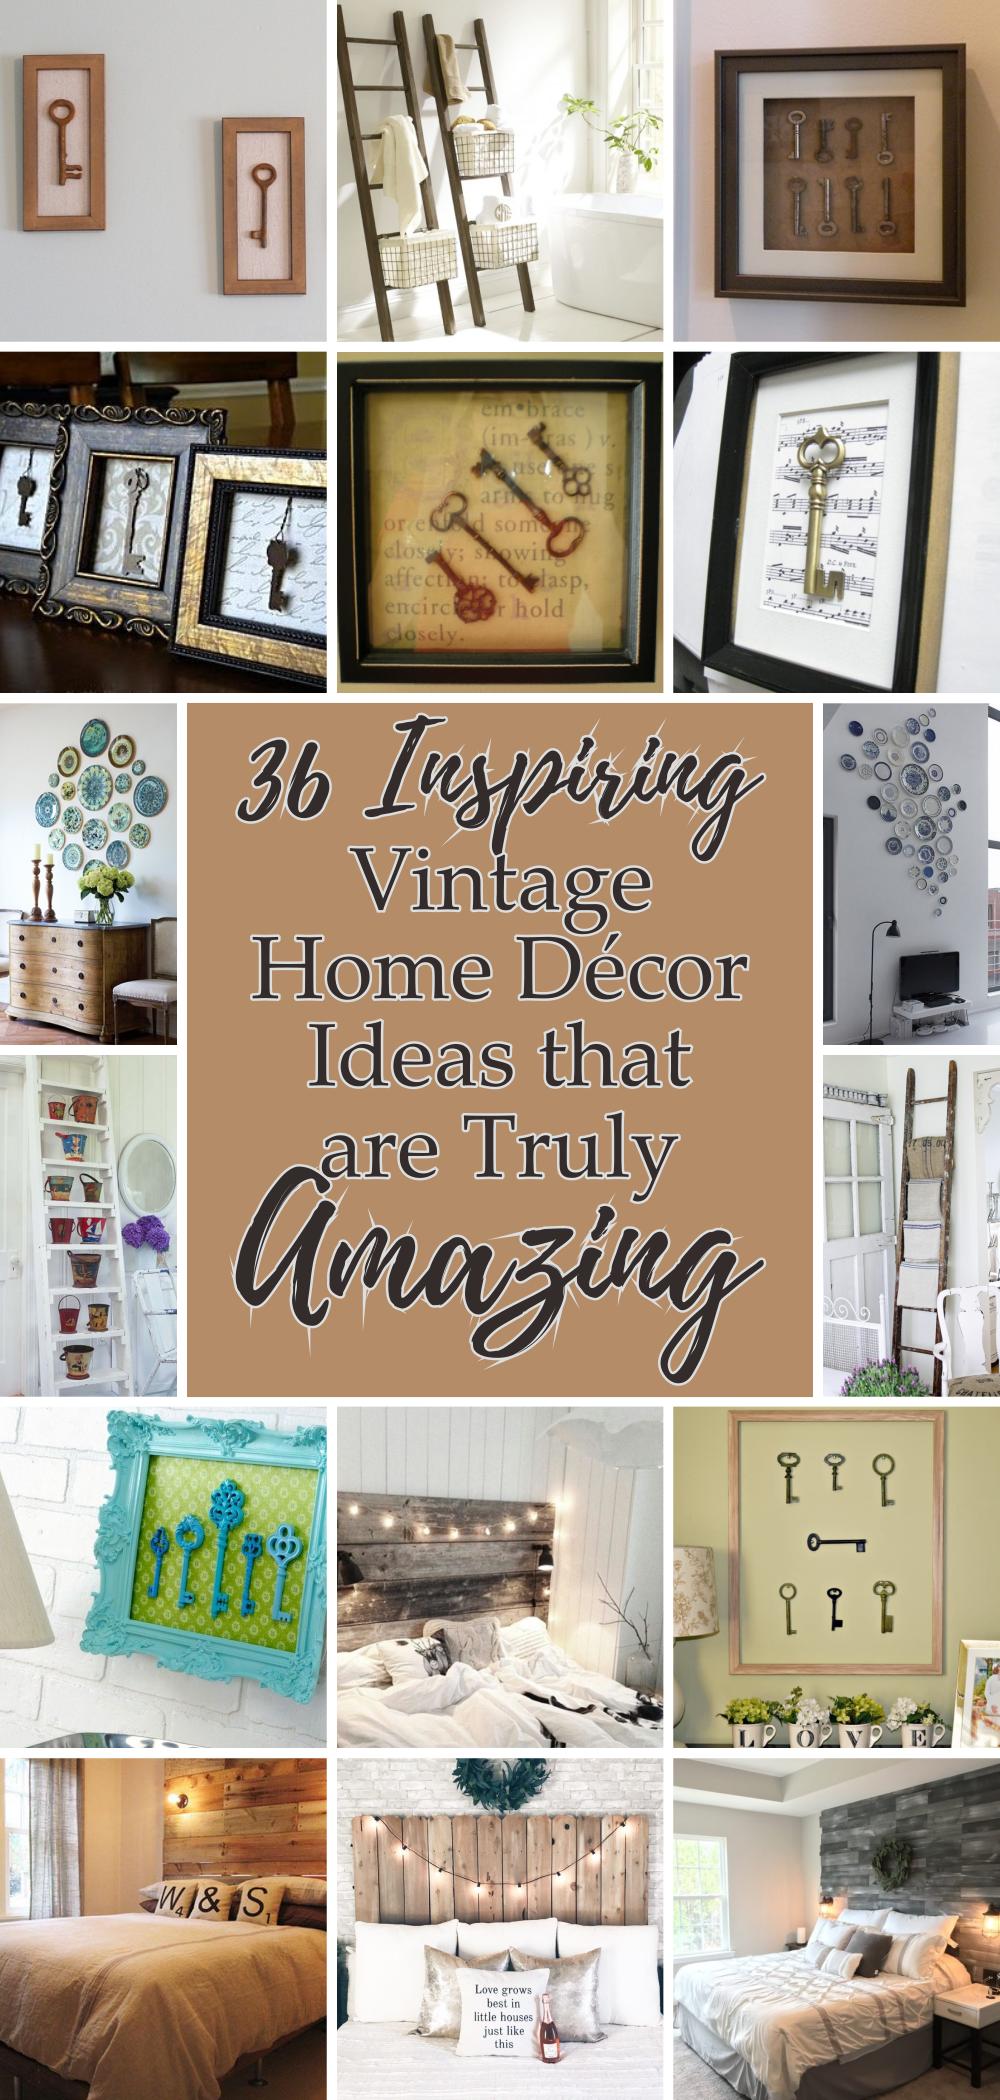 36 Inspiring Vintage Home Decor Ideas That Are Truly Amazing Talkdecor